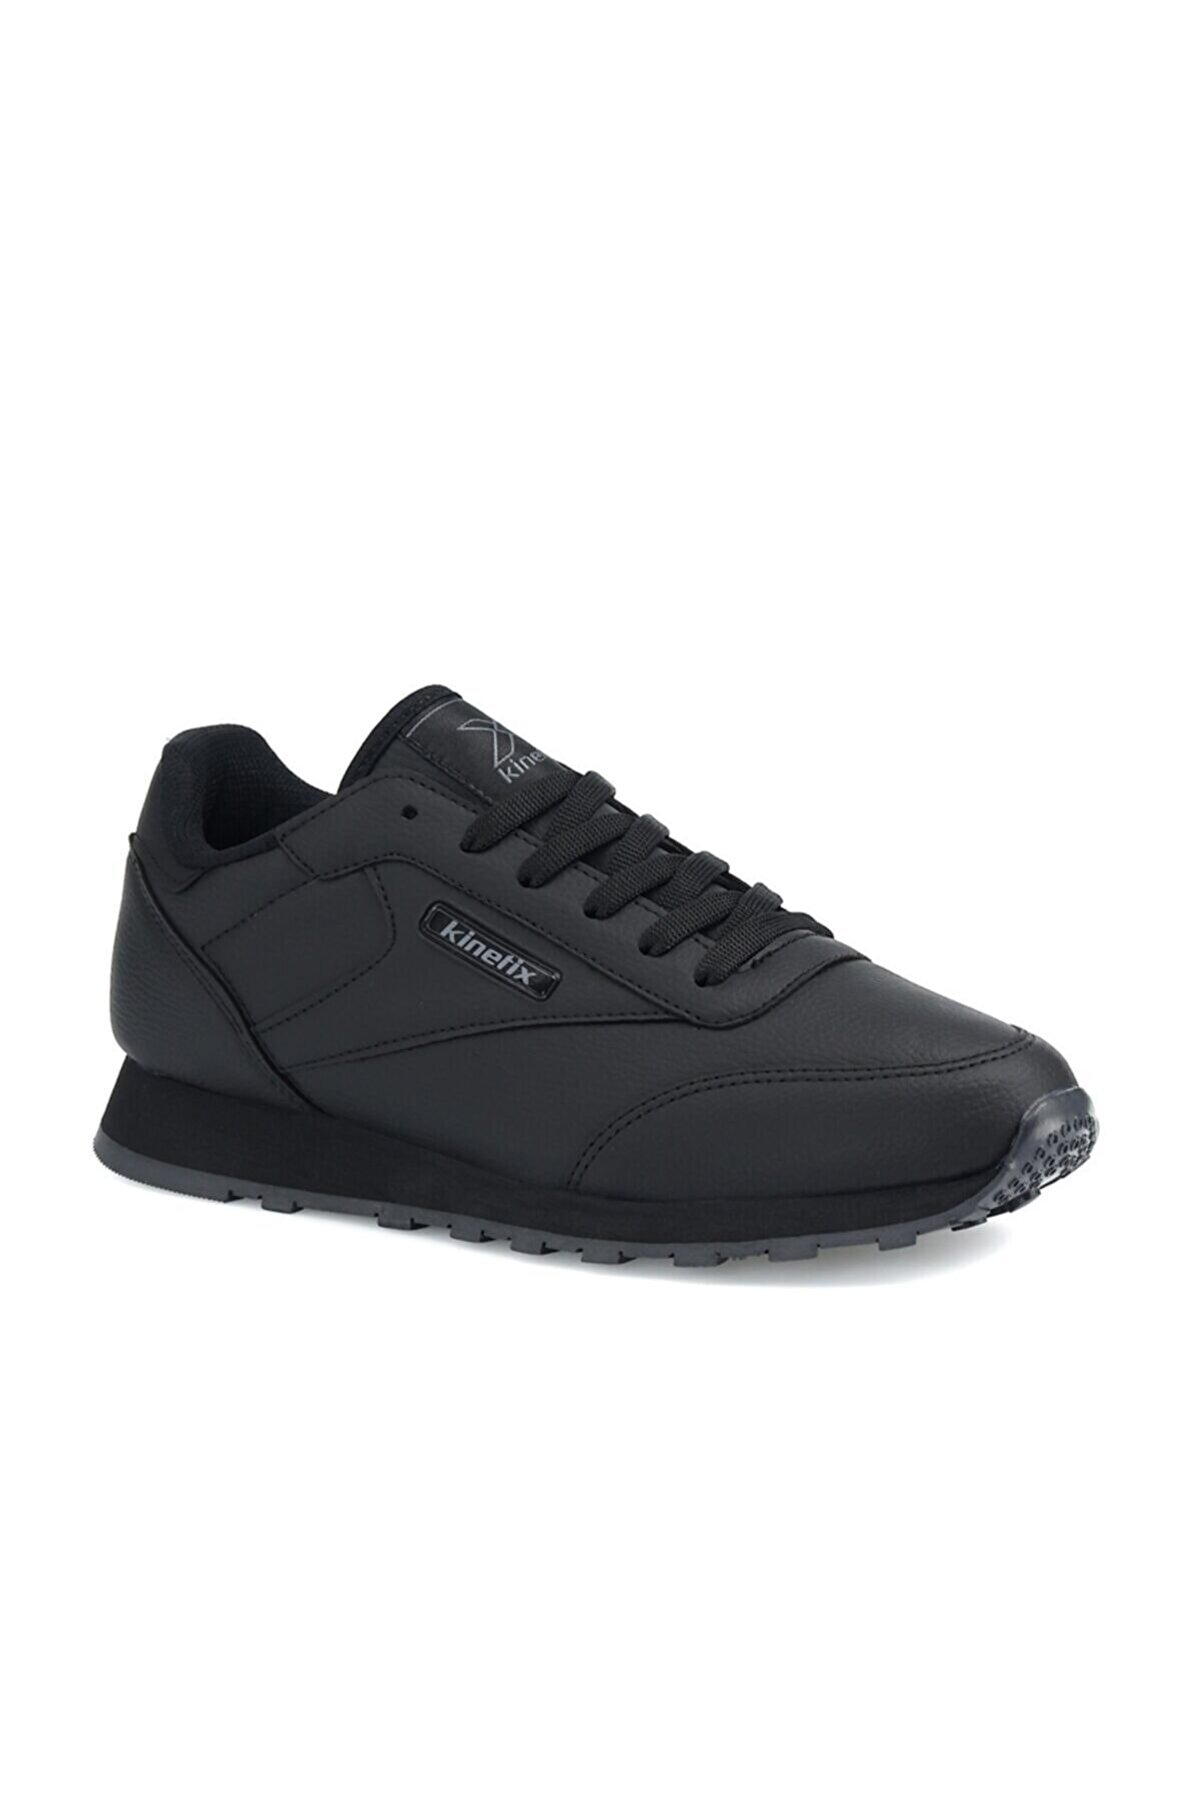 Kinetix 1f Lower Pu W 1pr Spor Ayakkabı Sıyah